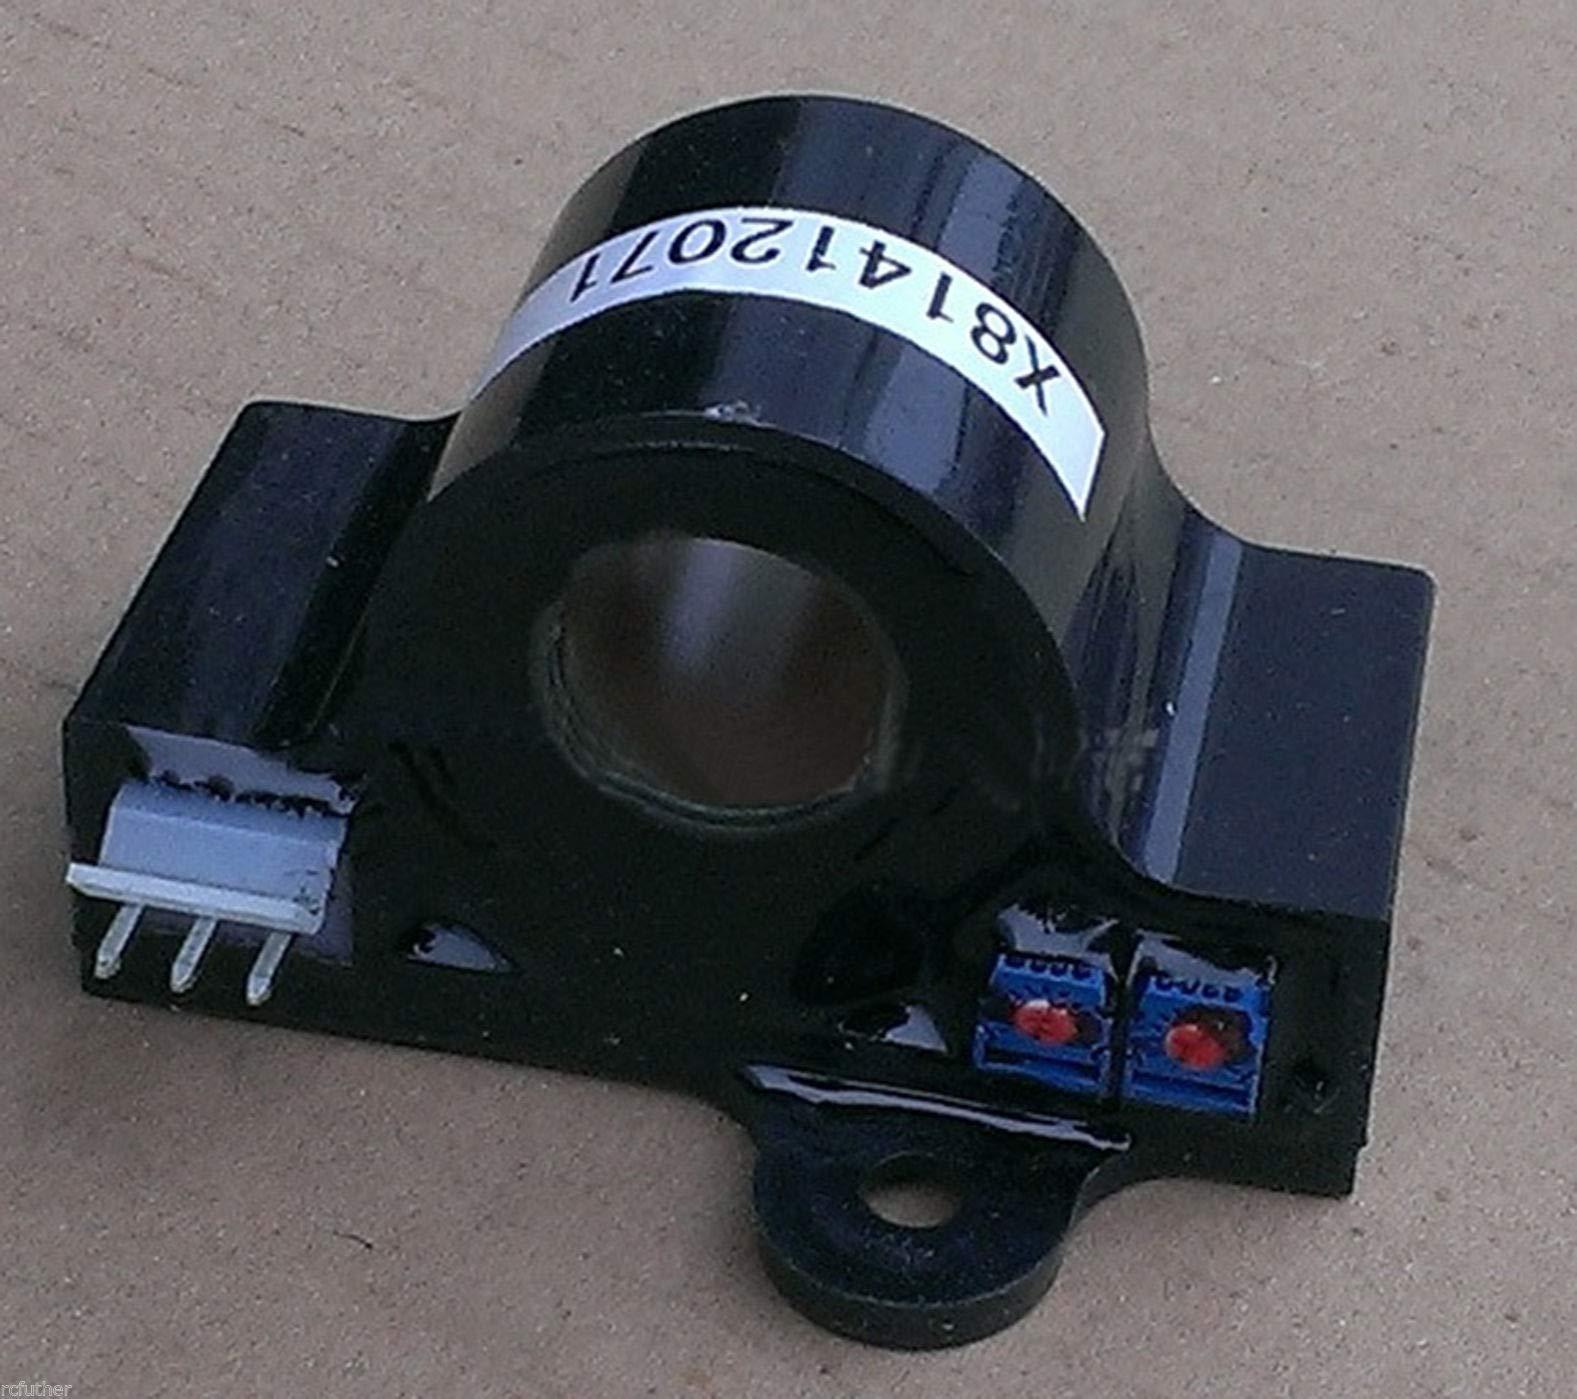 FidgetFidget Accelerator Hall Effect Sensor for Tomberlin Emerge, Part No.1007918,1008284 by FidgetFidget